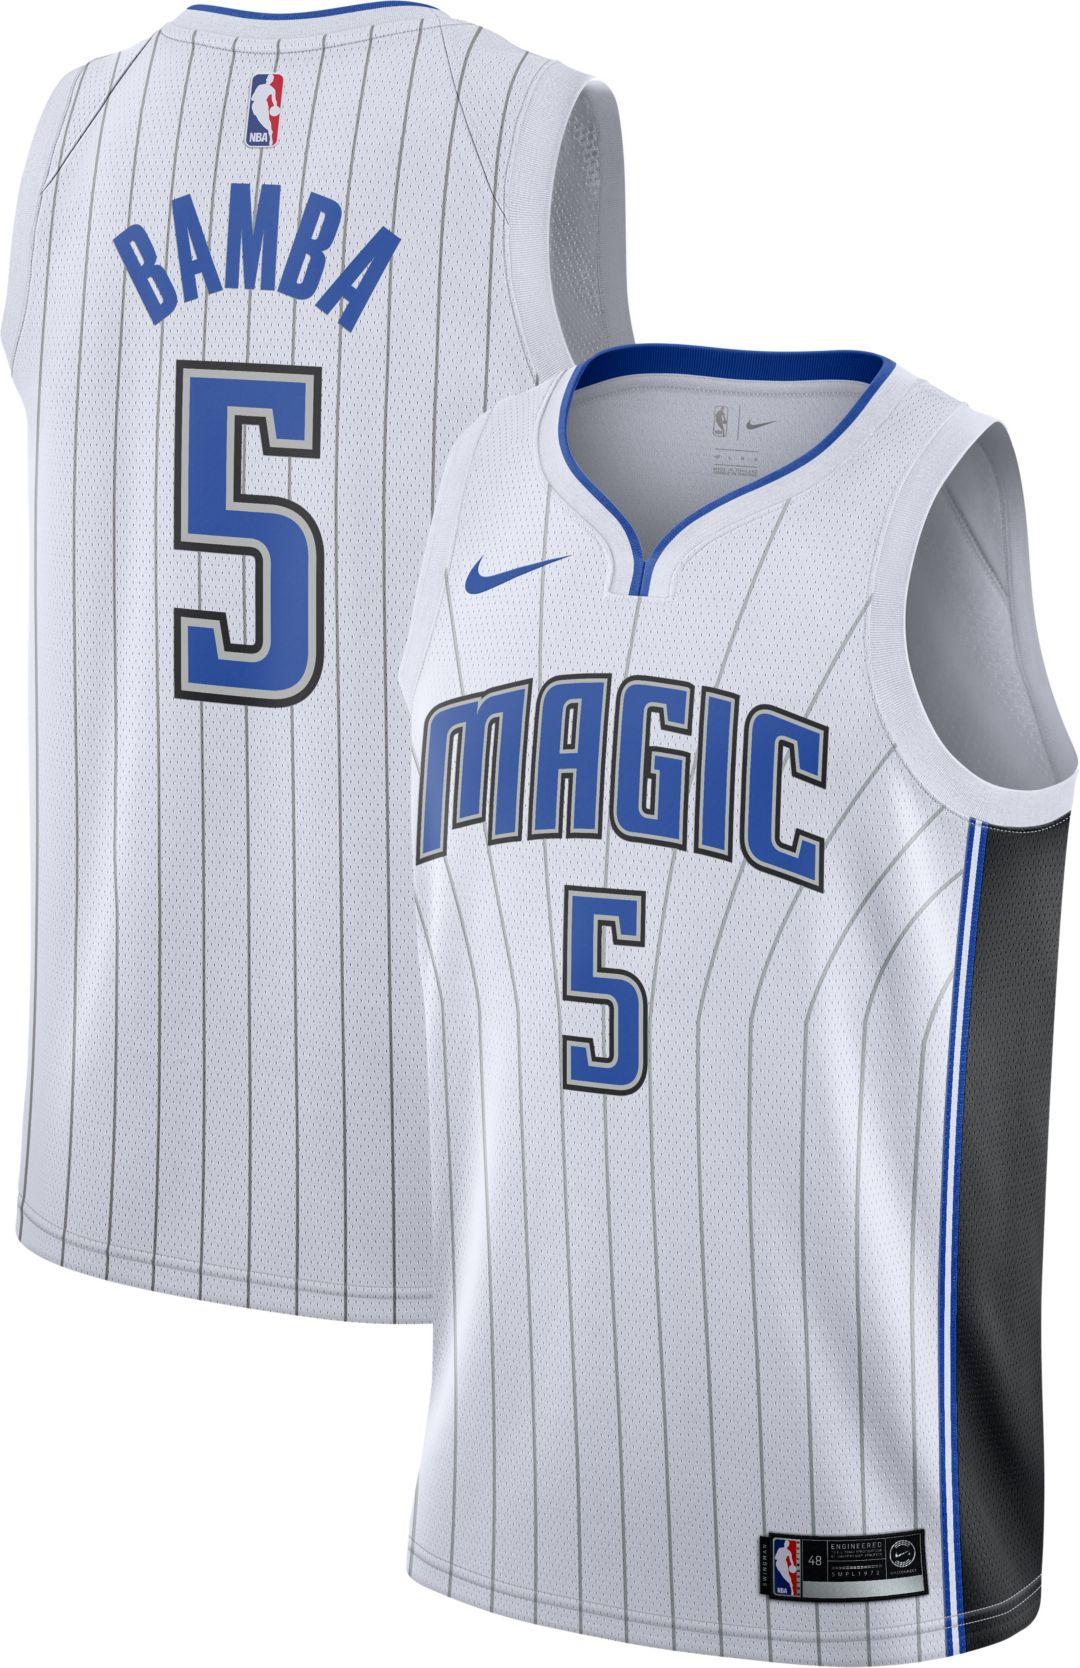 pretty nice 22bbd 5fb07 Nike Men's Orlando Magic Mohamed Bamba #5 White Dri-FIT Swingman Jersey